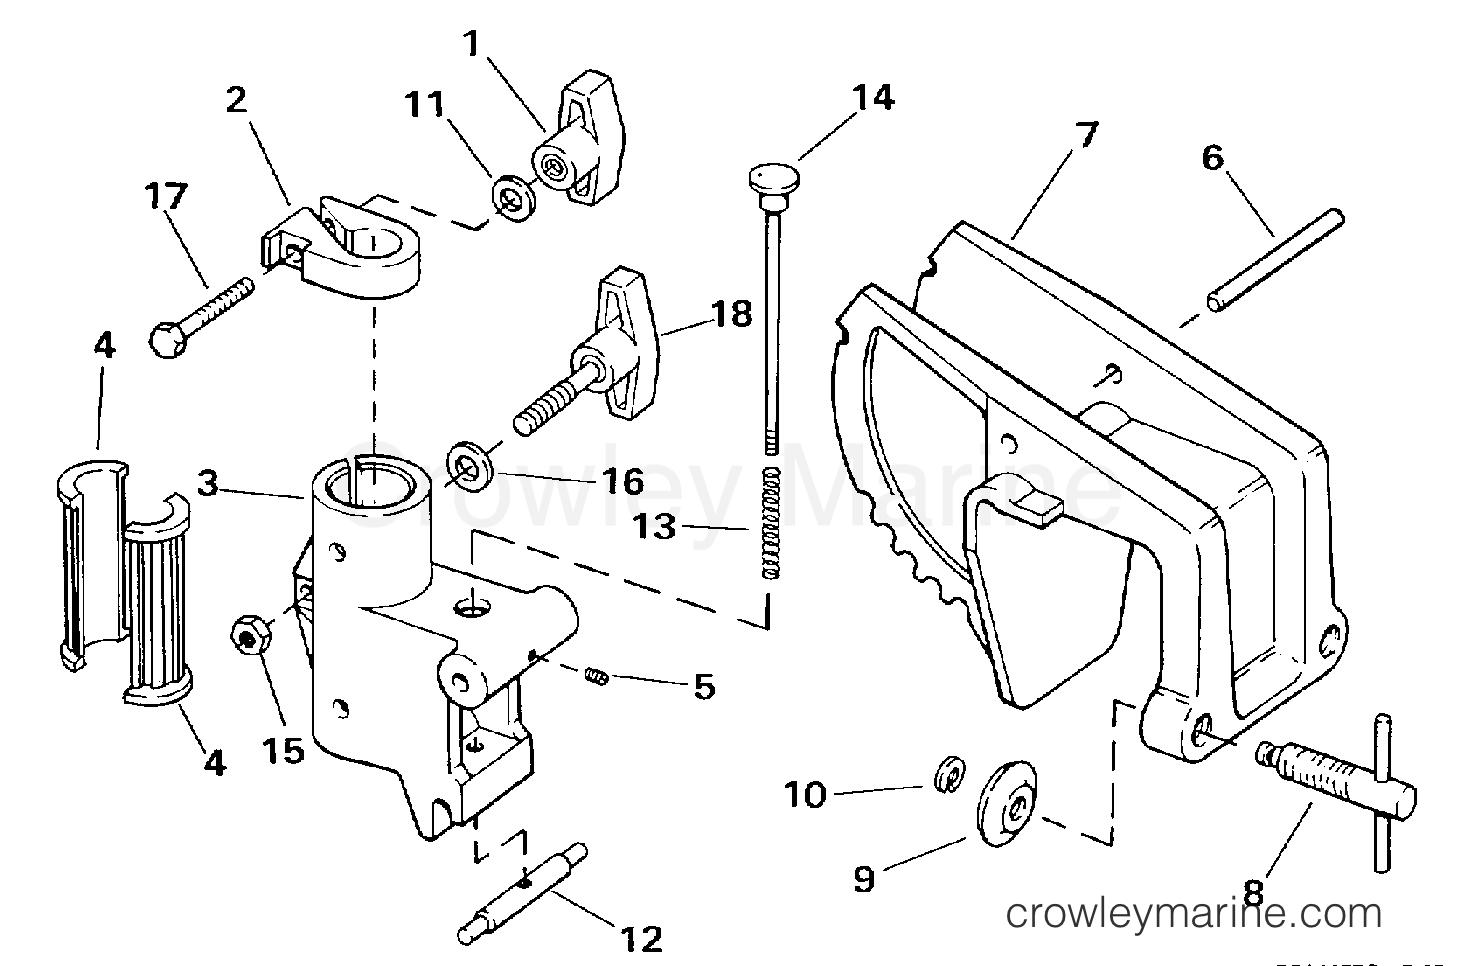 1997 Electric Motors 24 Volt - BF4P - TRANSOM MOUNT STERN BRACKET